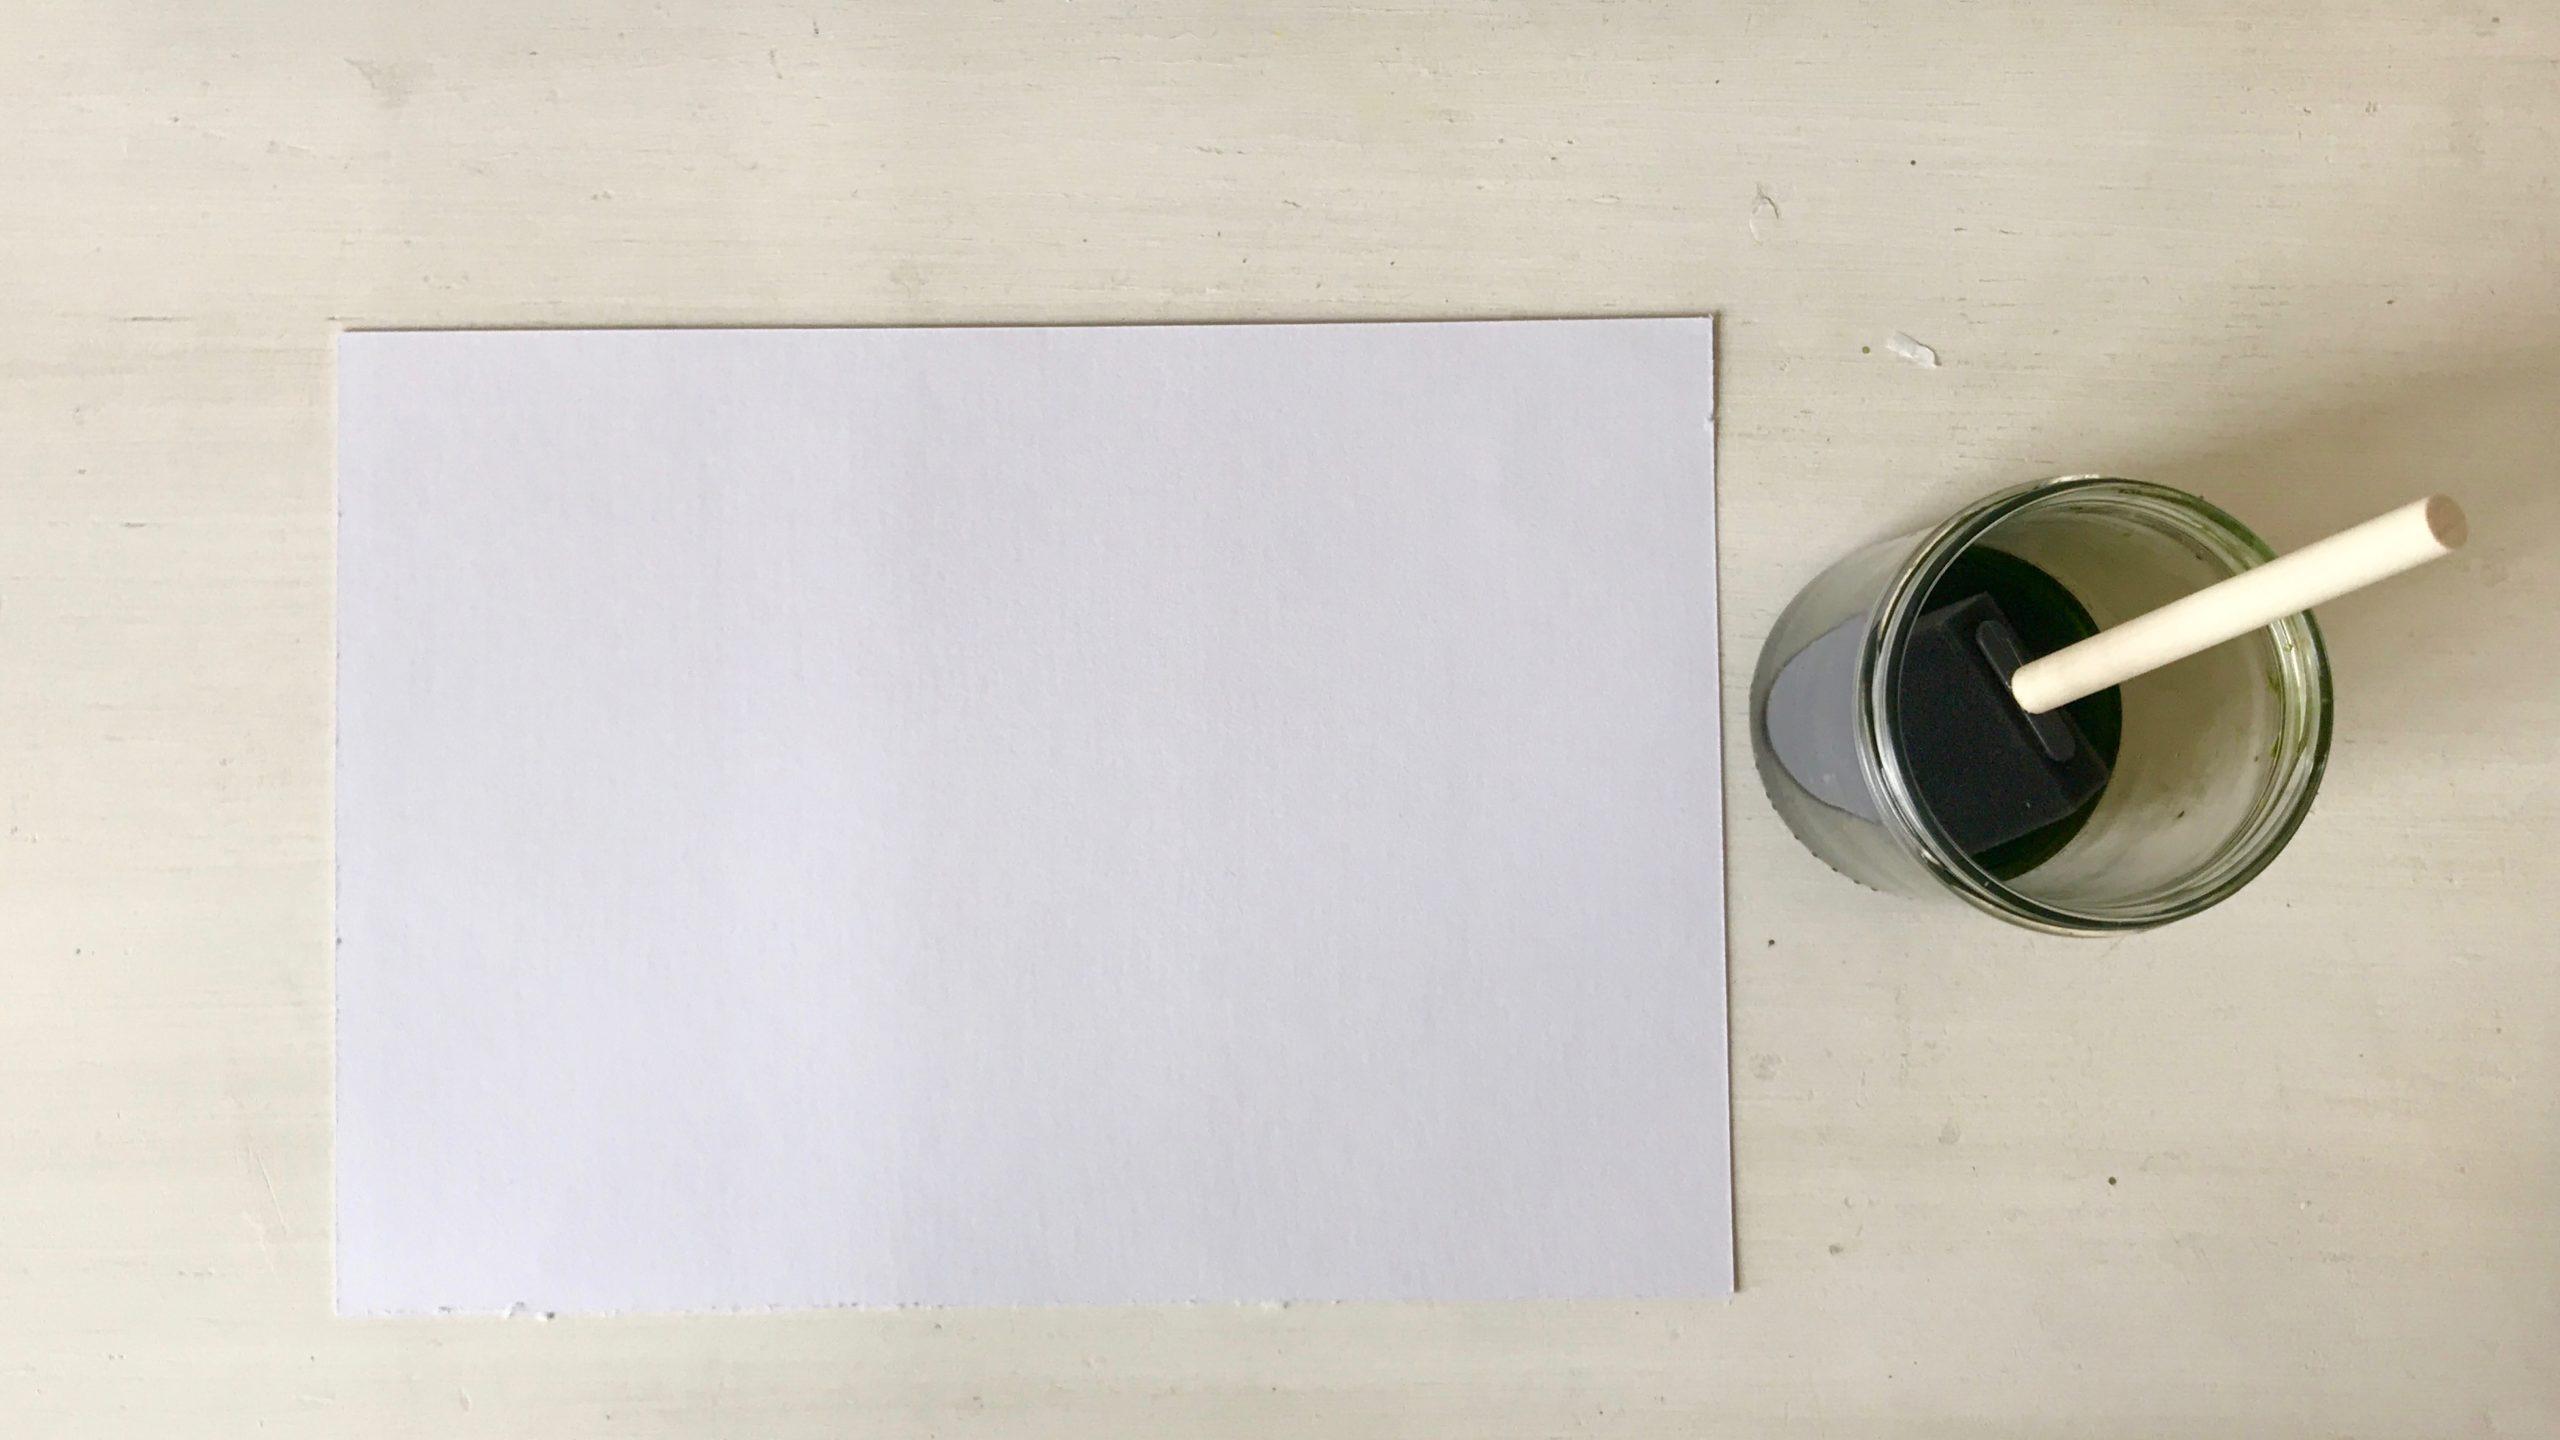 Zonneprint lichtgevoelig papier prepareren